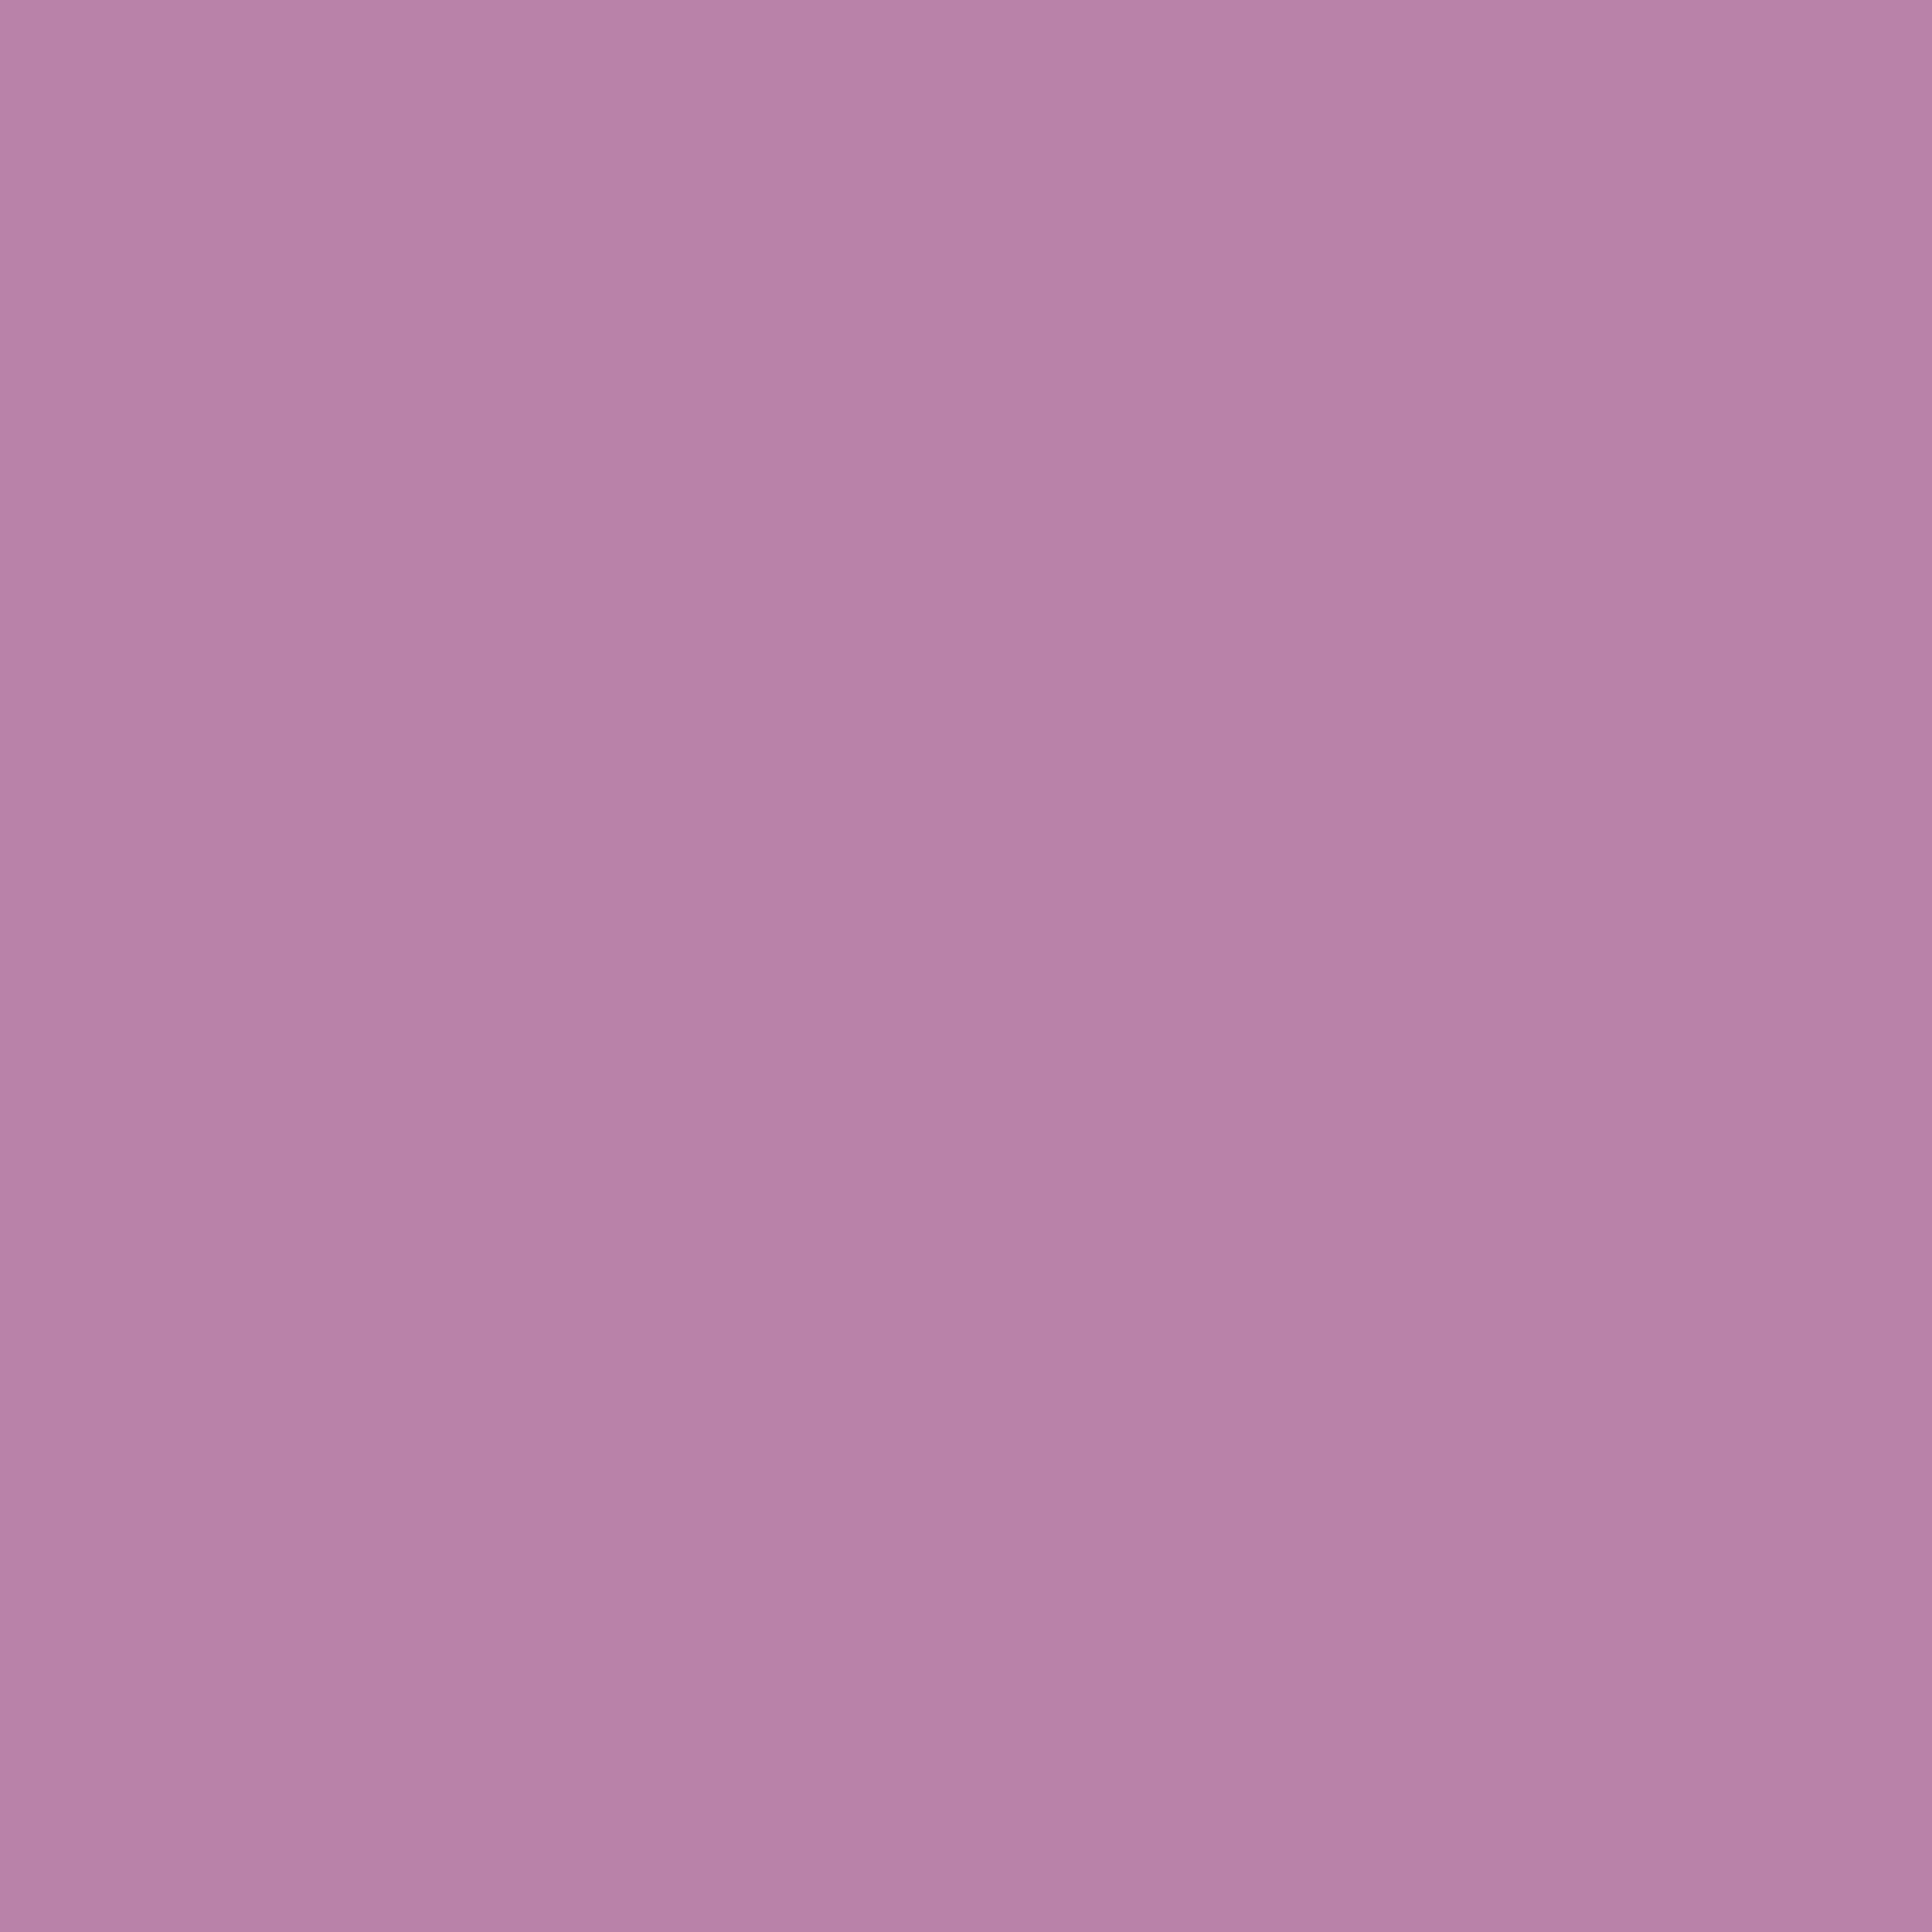 2048x2048 Opera Mauve Solid Color Background